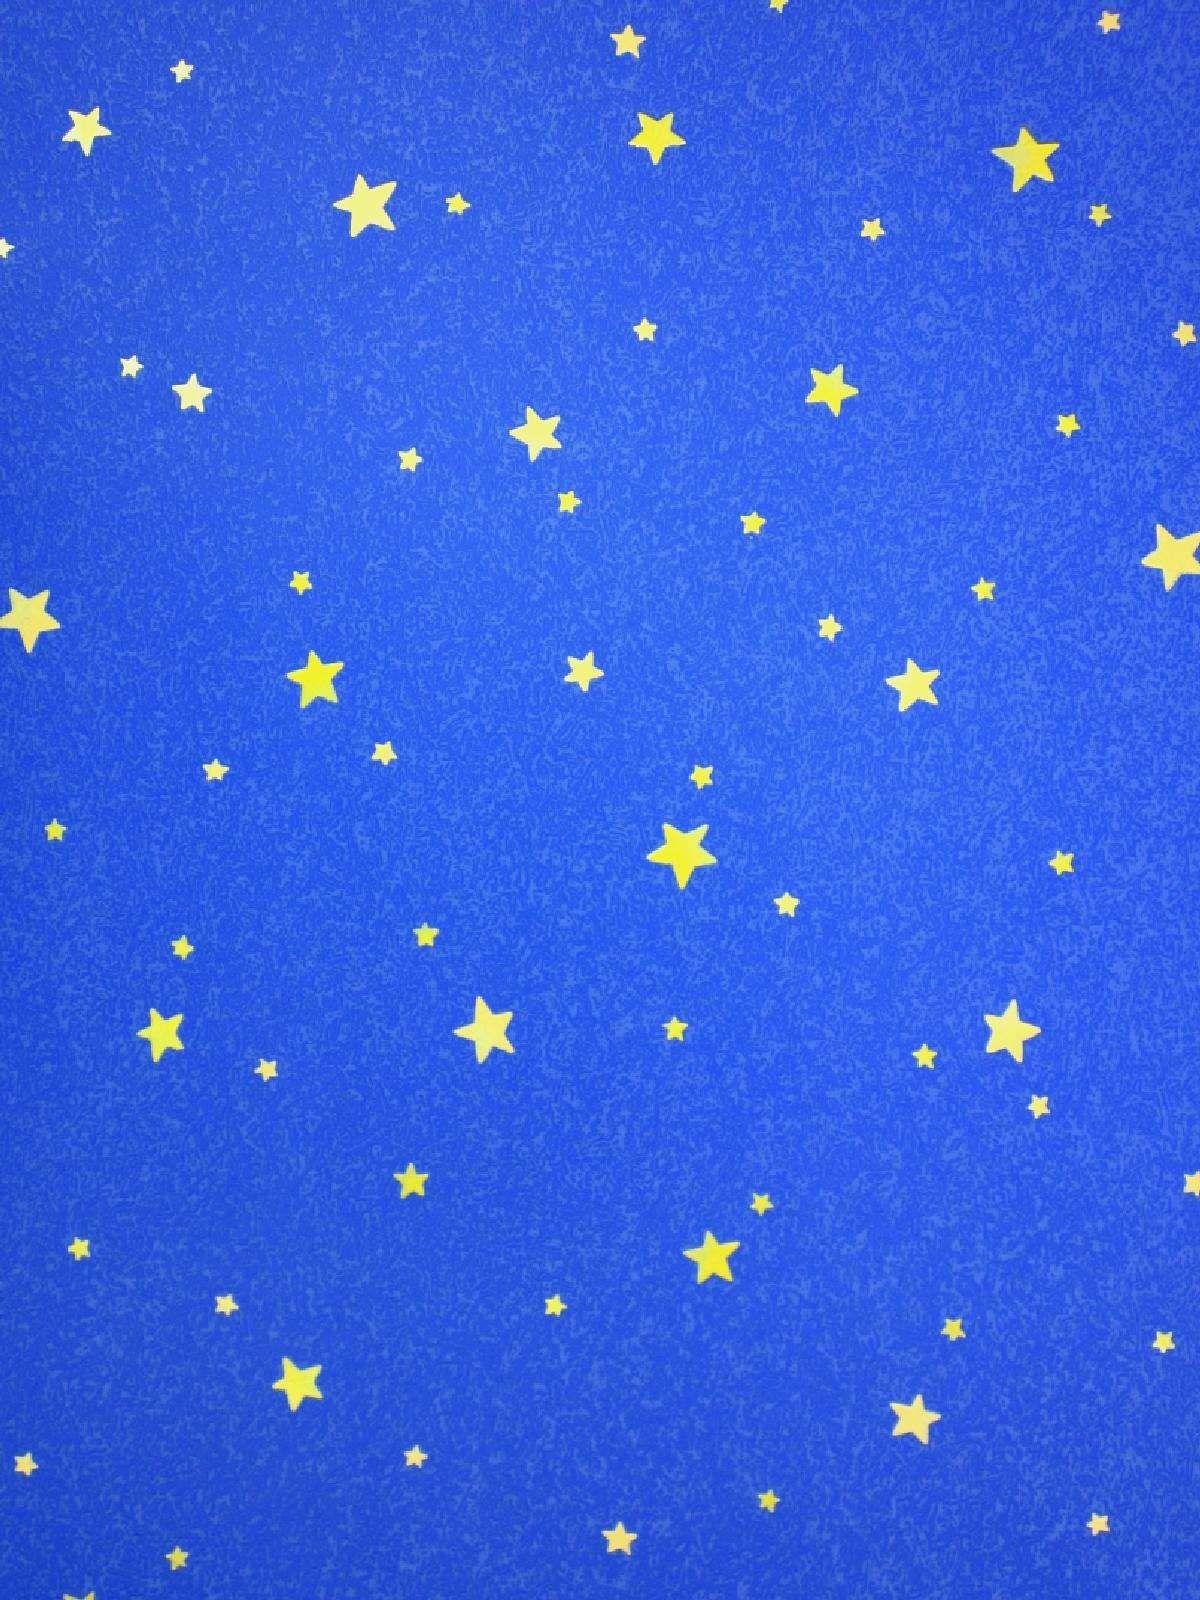 Blue stripe wallpaper ebay - Blue Wallpaper With Yellow Stars Ebay